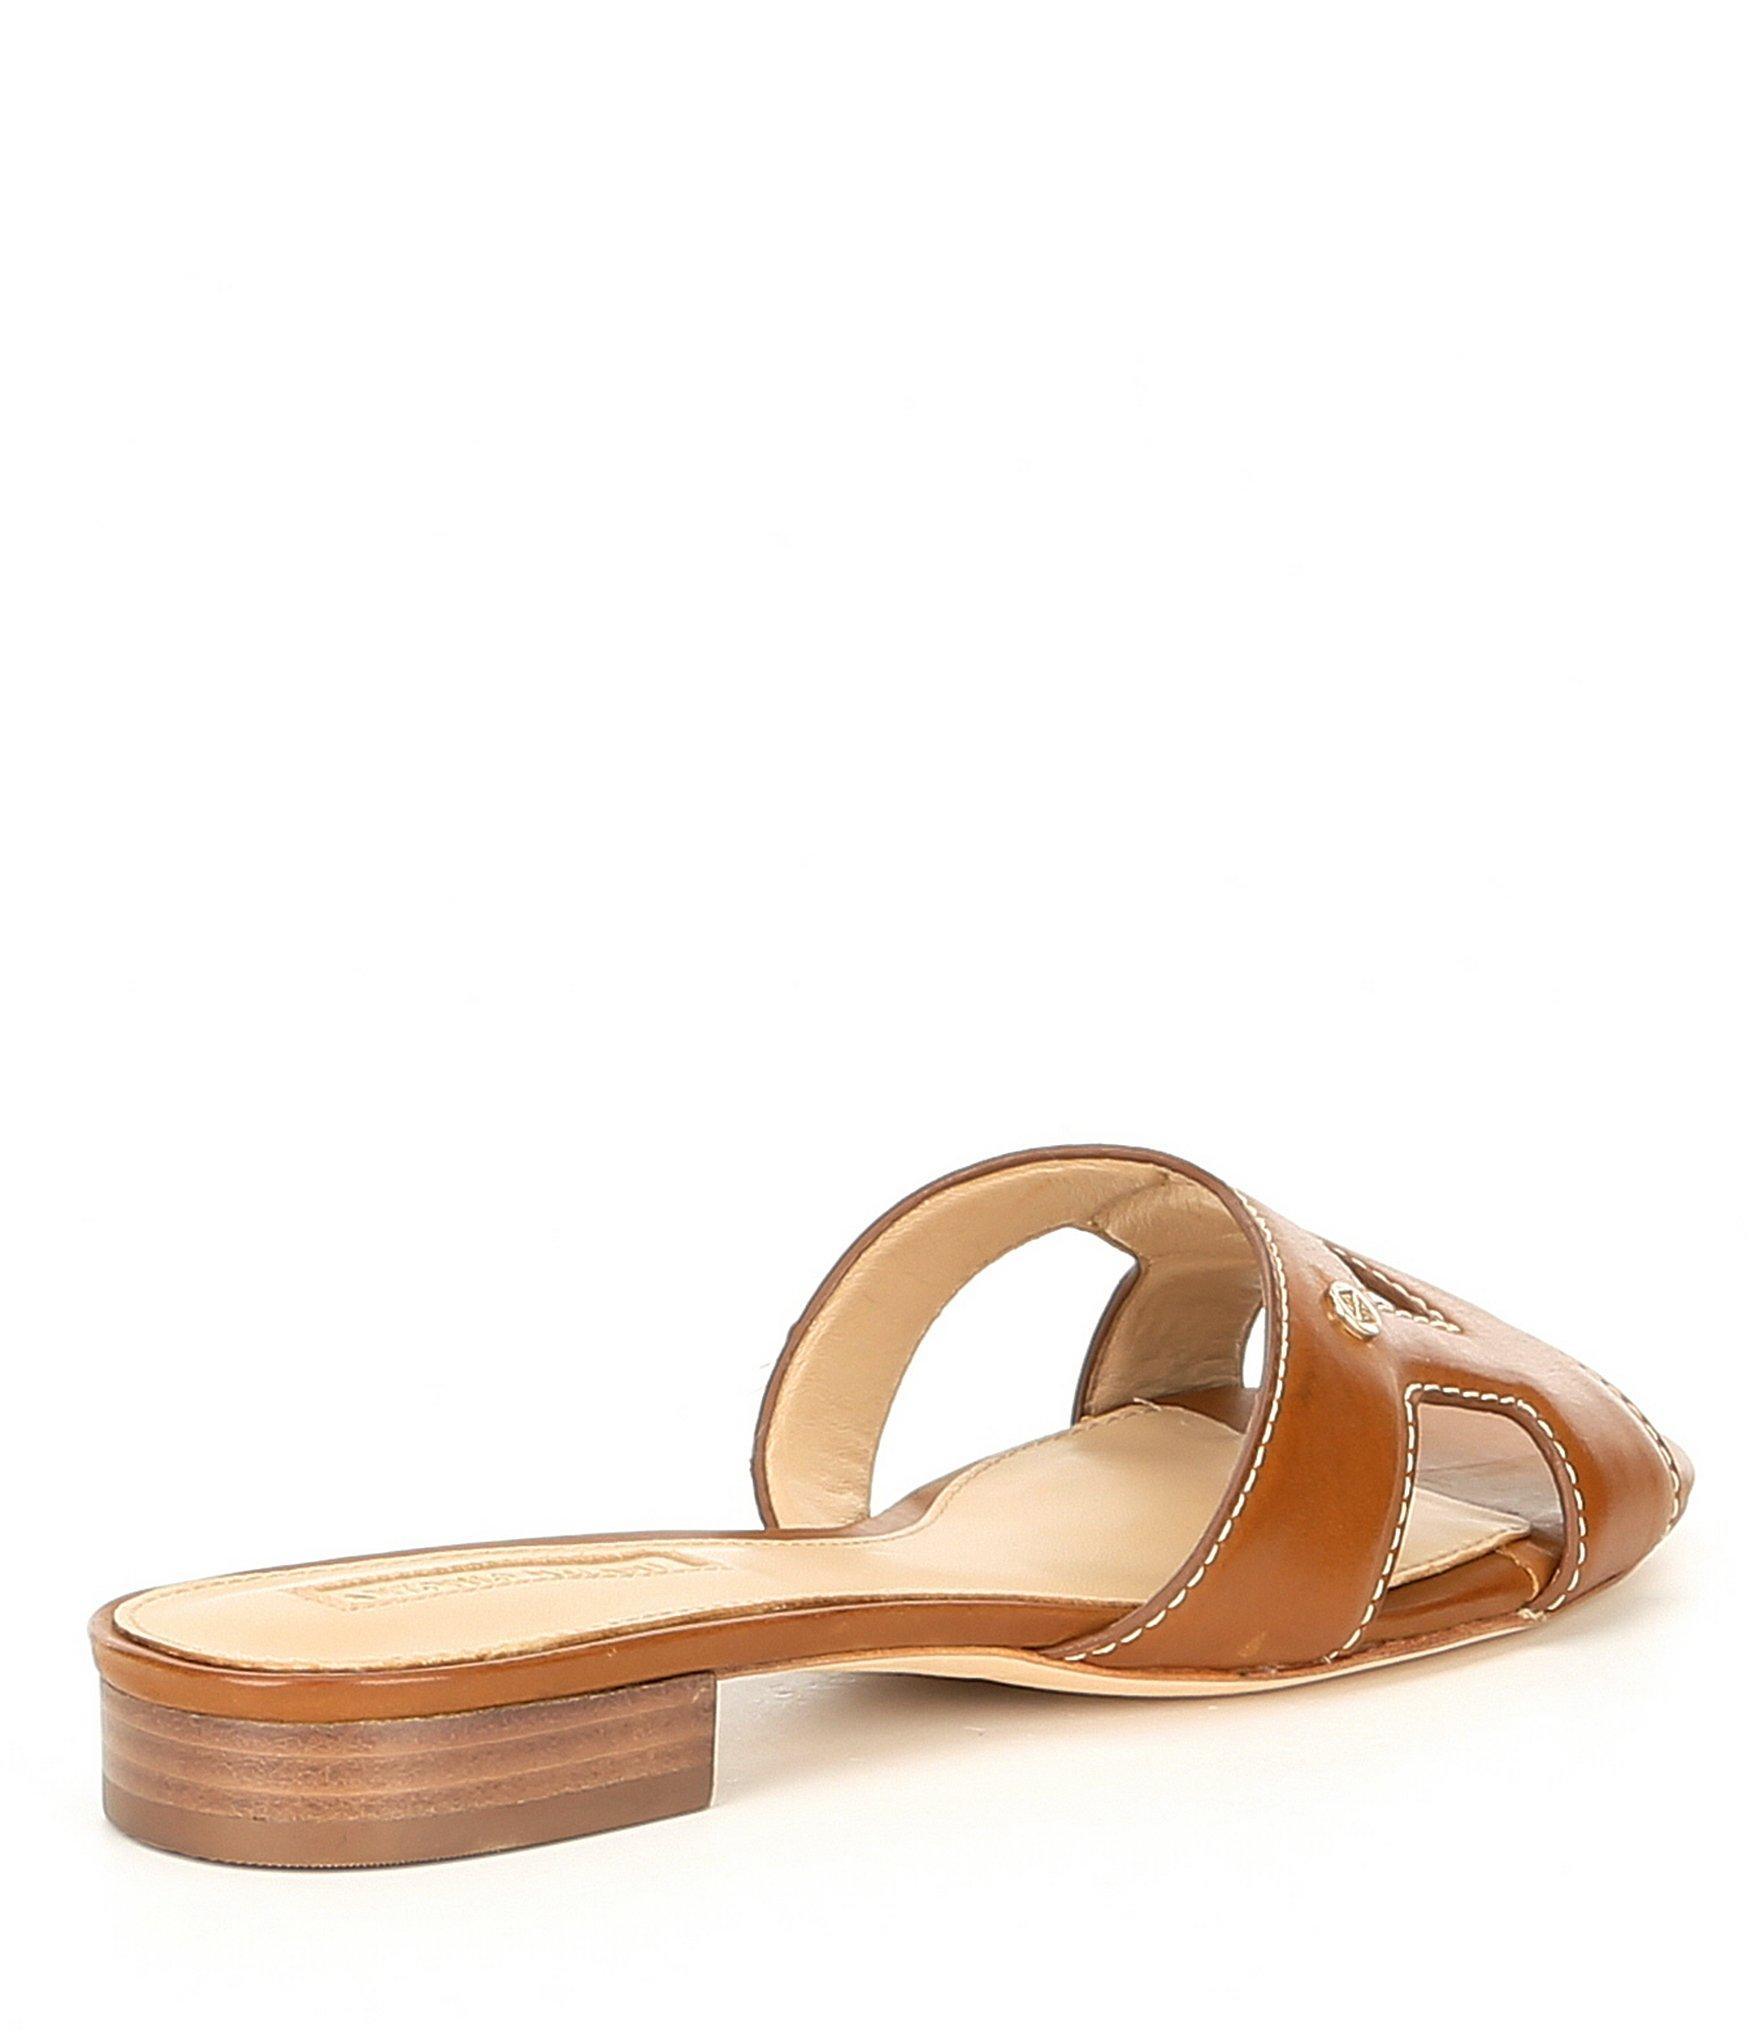 6cd229740c26 Lyst - Antonio Melani Carrah Burnished Leather Logo Slide Sandals in ...